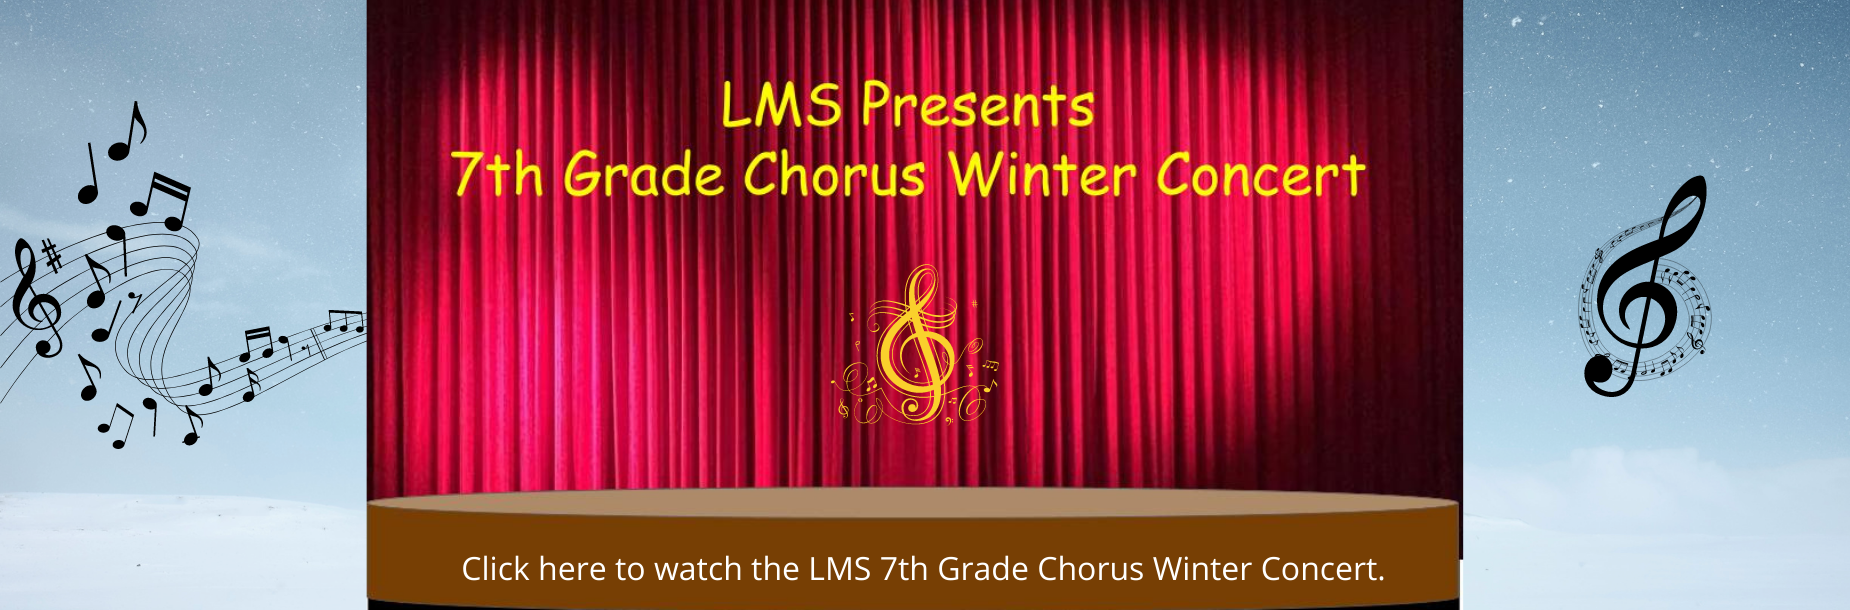 7th grade chorus winter chorus concert link